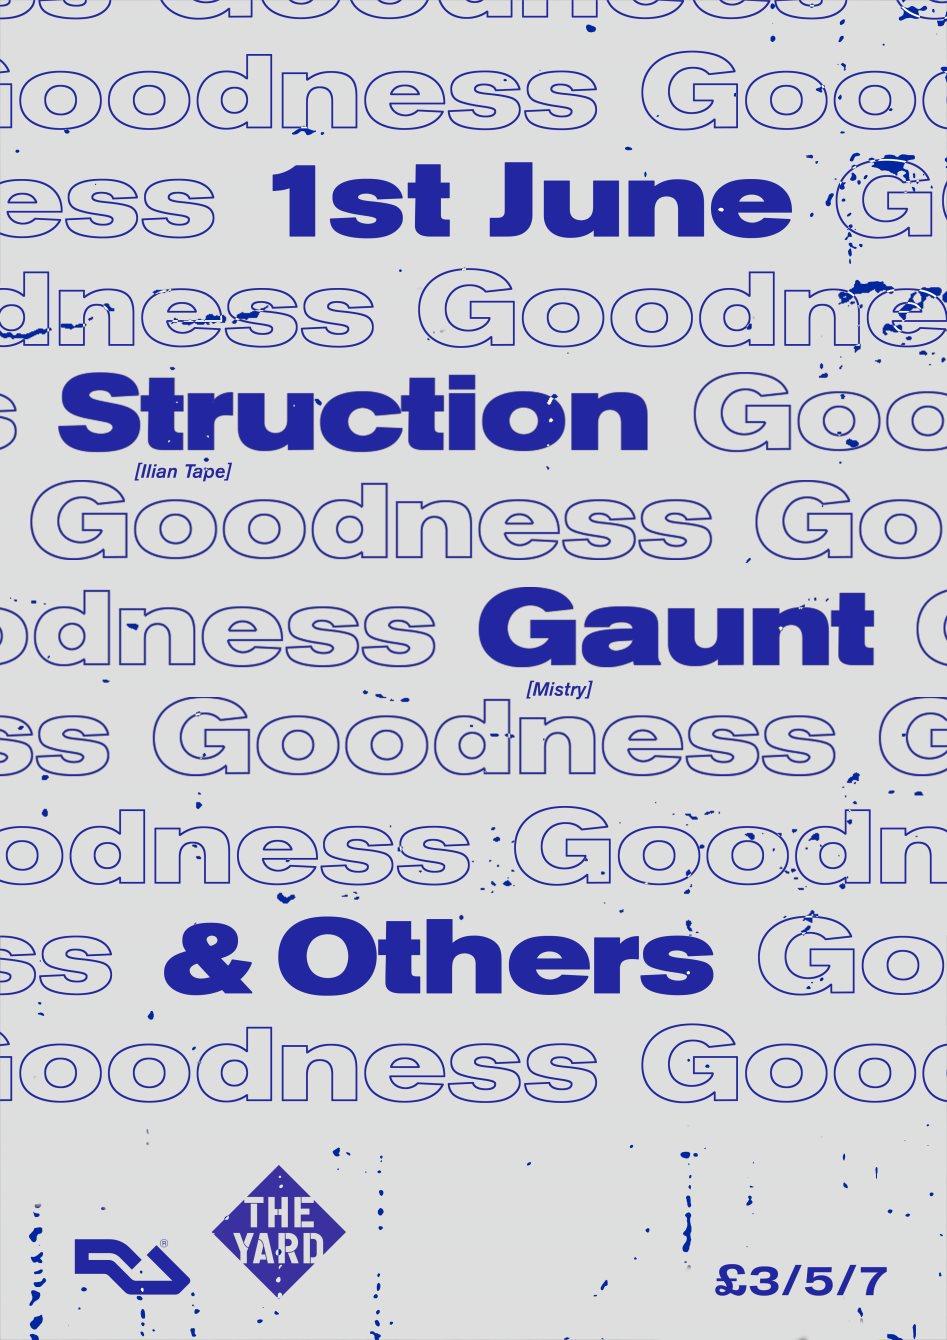 Goodness: Struction, Gaunt & More - Flyer front